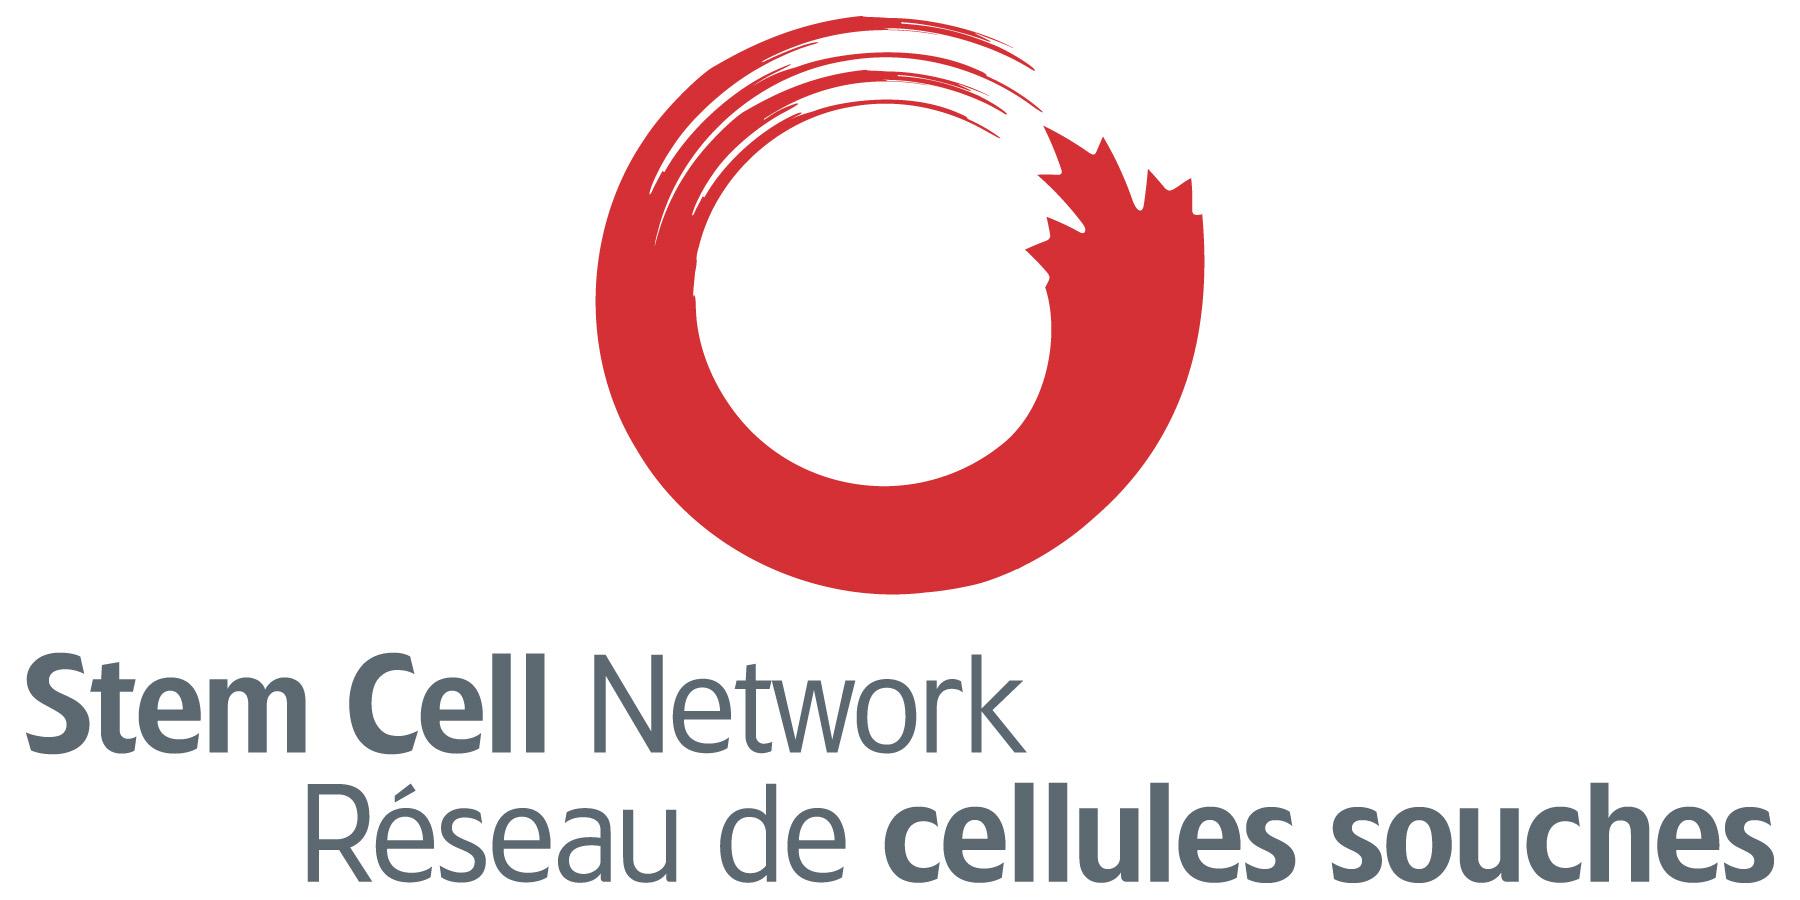 Stem Cell Network